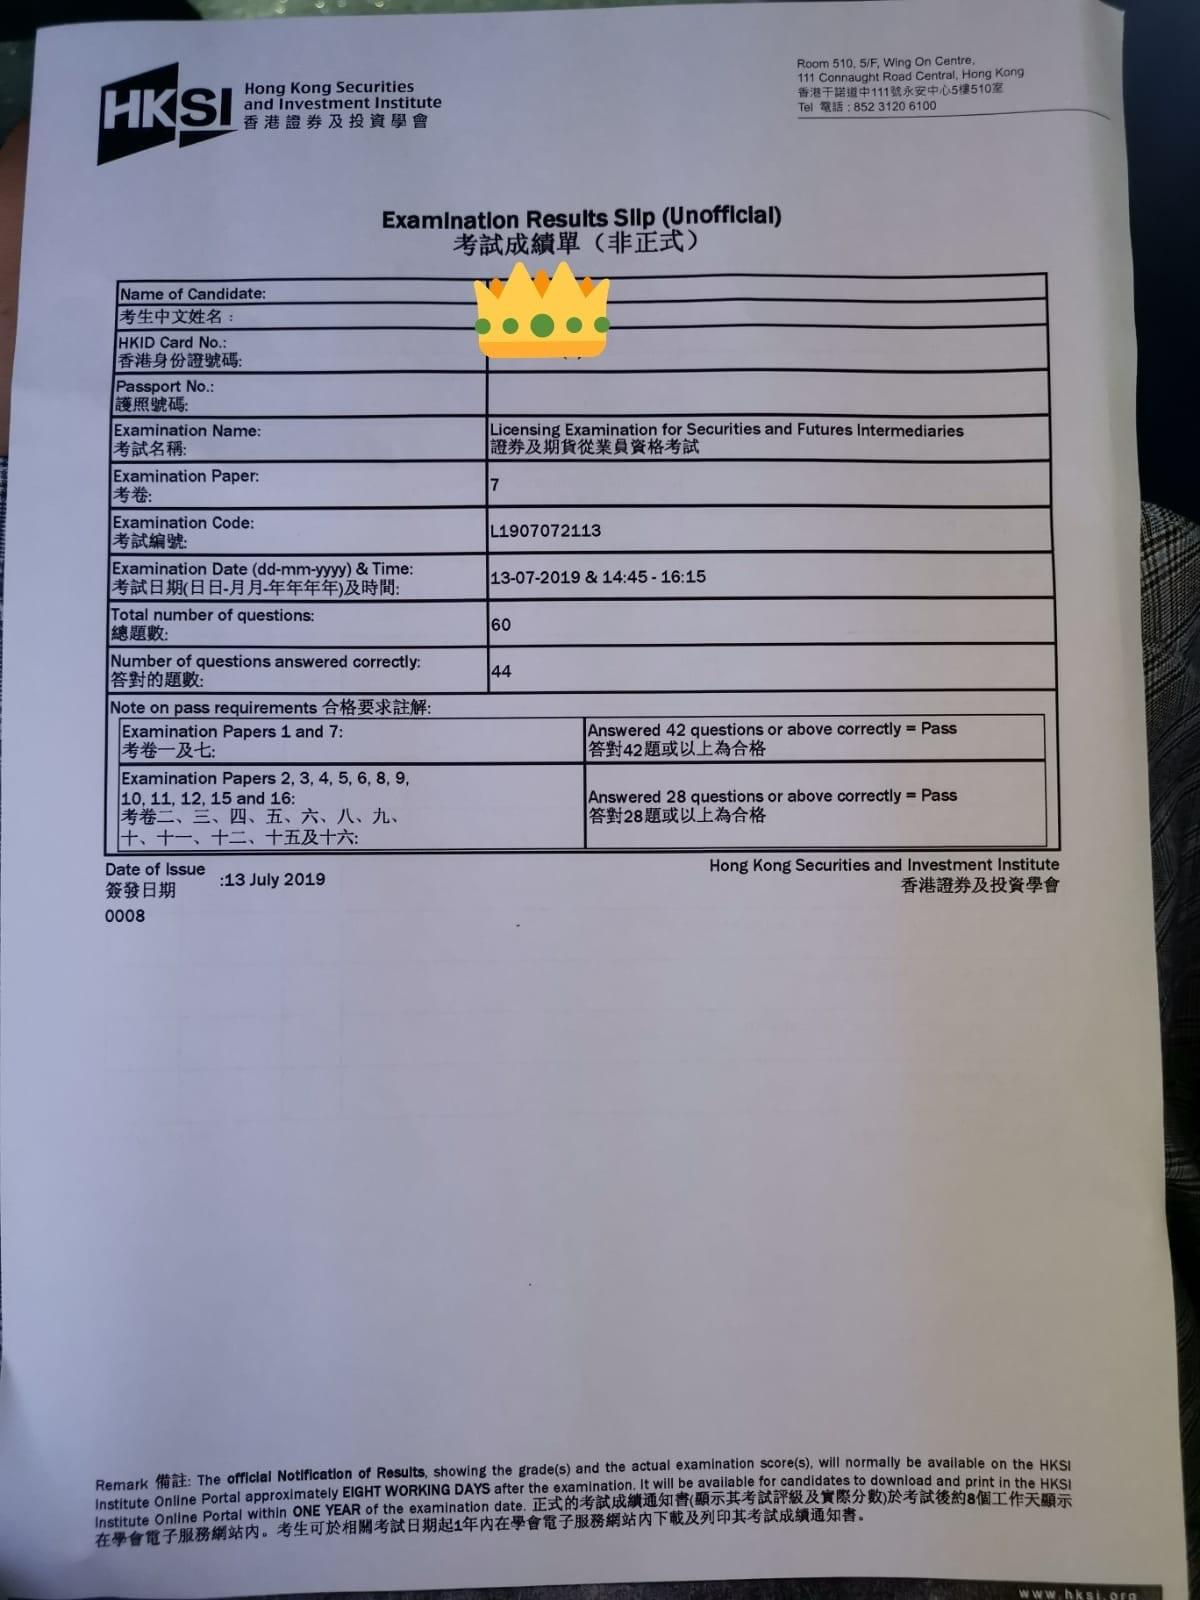 KLZ 13/8/2019 LE Paper 7 證券期貨從業員資格考試卷七 Pass